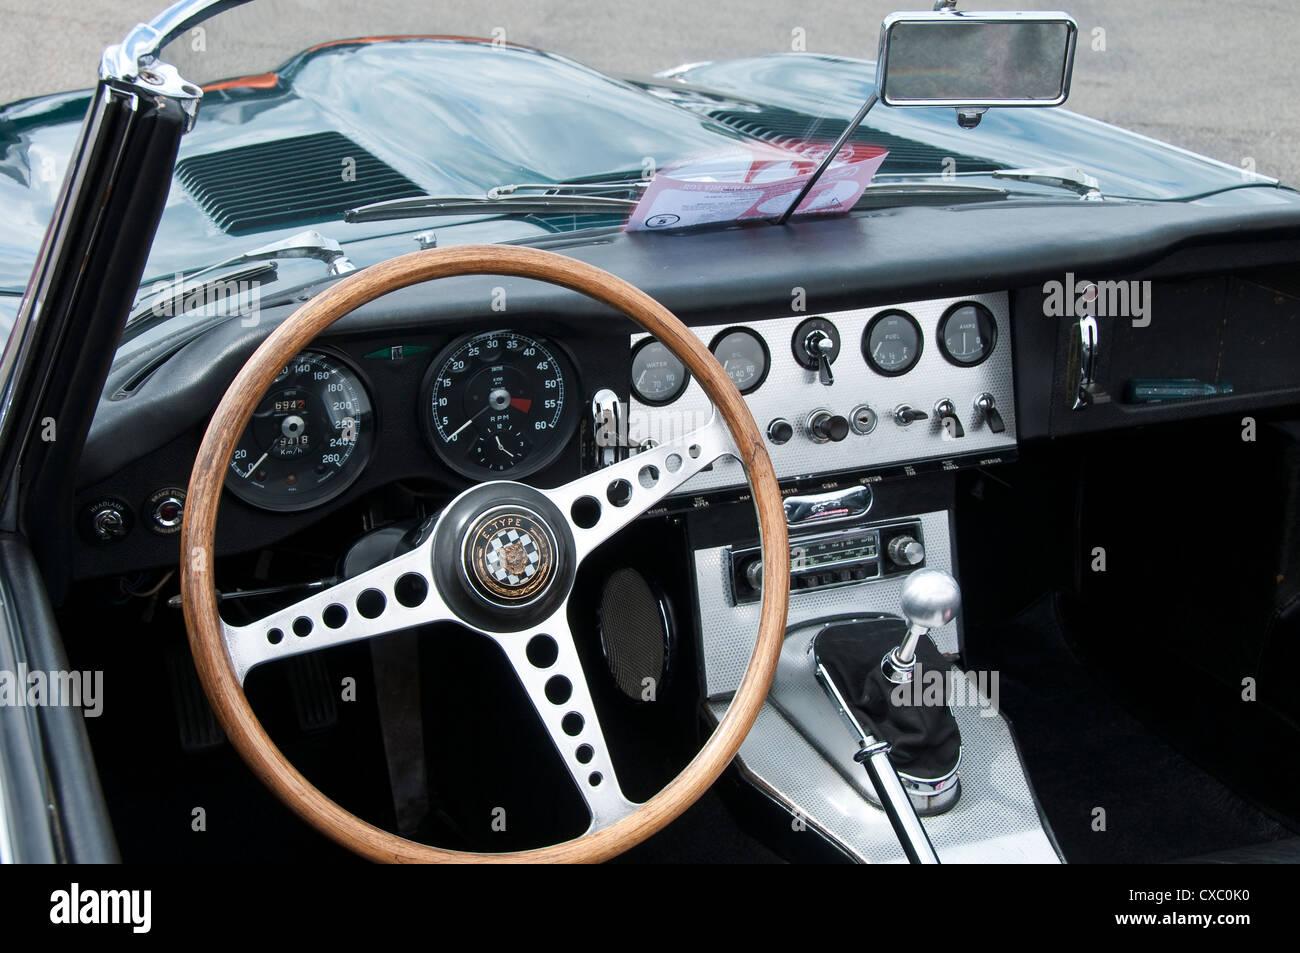 E Type Jaguar Interior   Stock Image